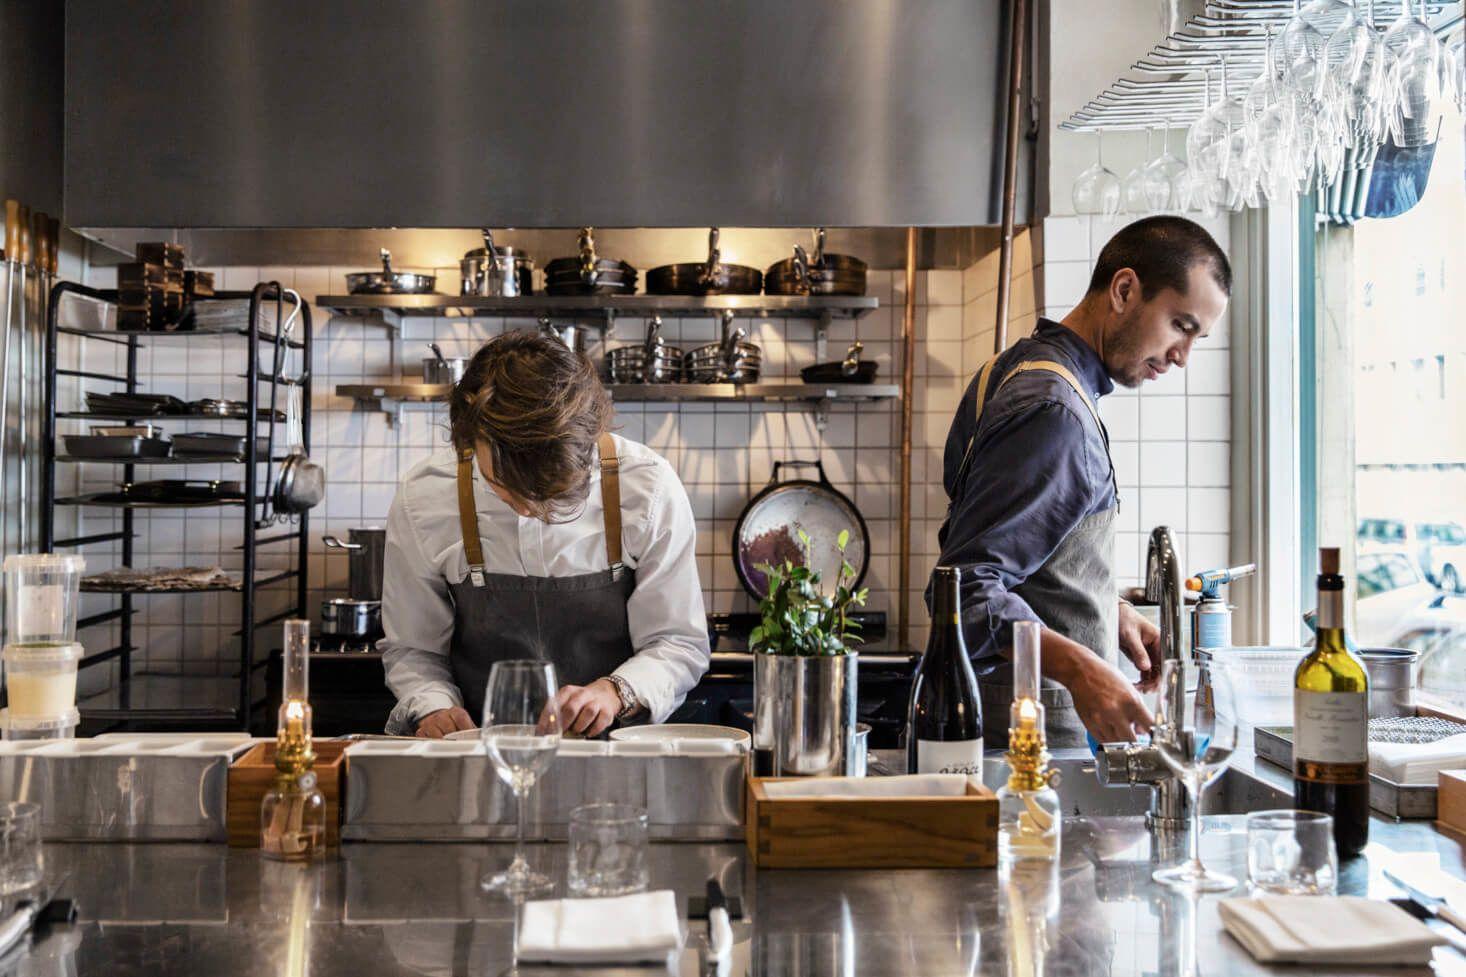 Filip Fasten, Michelin star chef of Agrikultur in Stockholm